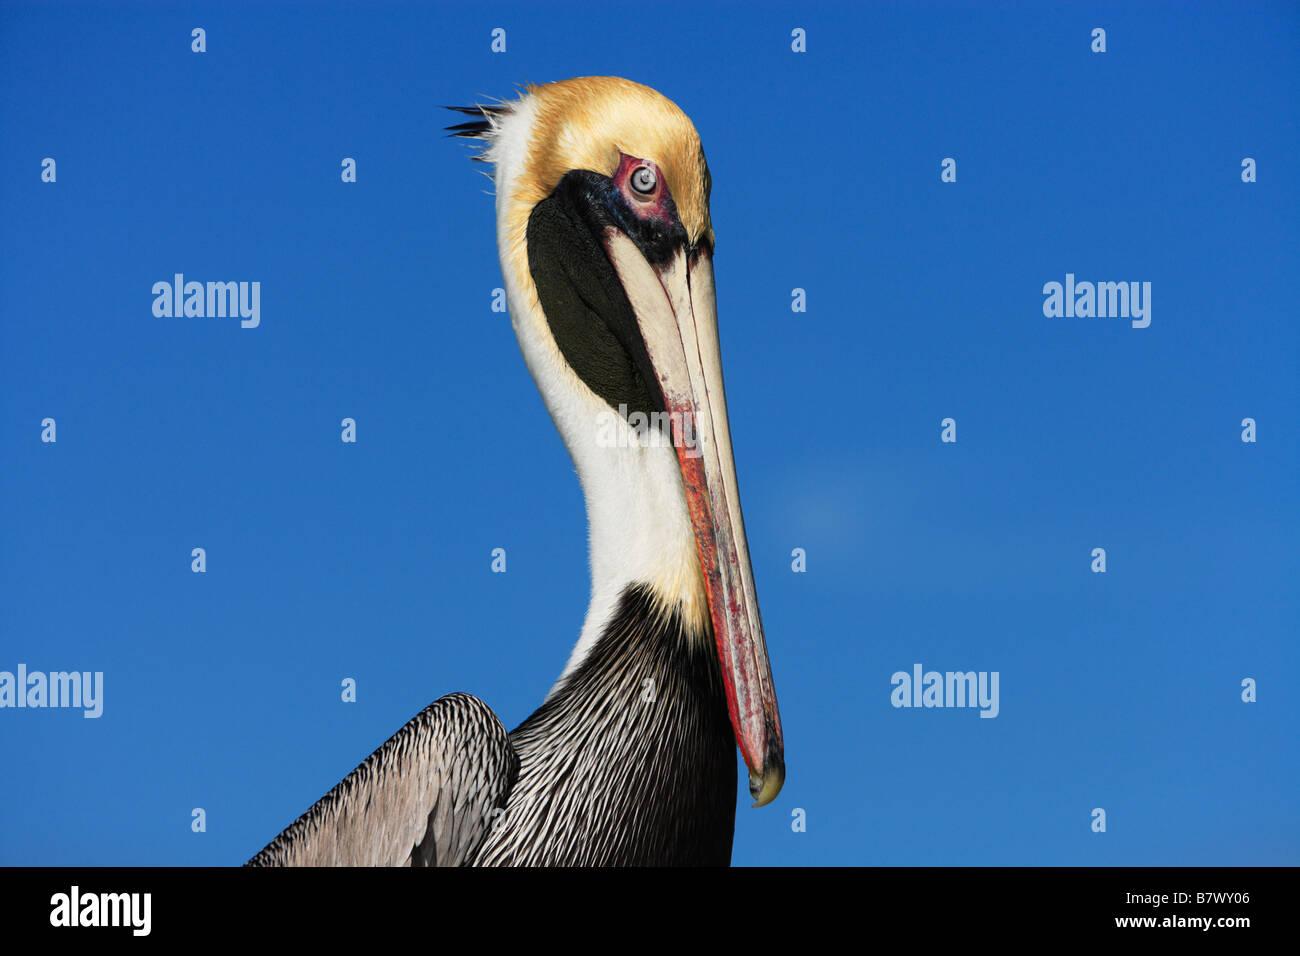 Porträt von einem braunen Pelikan (Pelecanus Occidentalis) in Key West, Florida. Stockbild